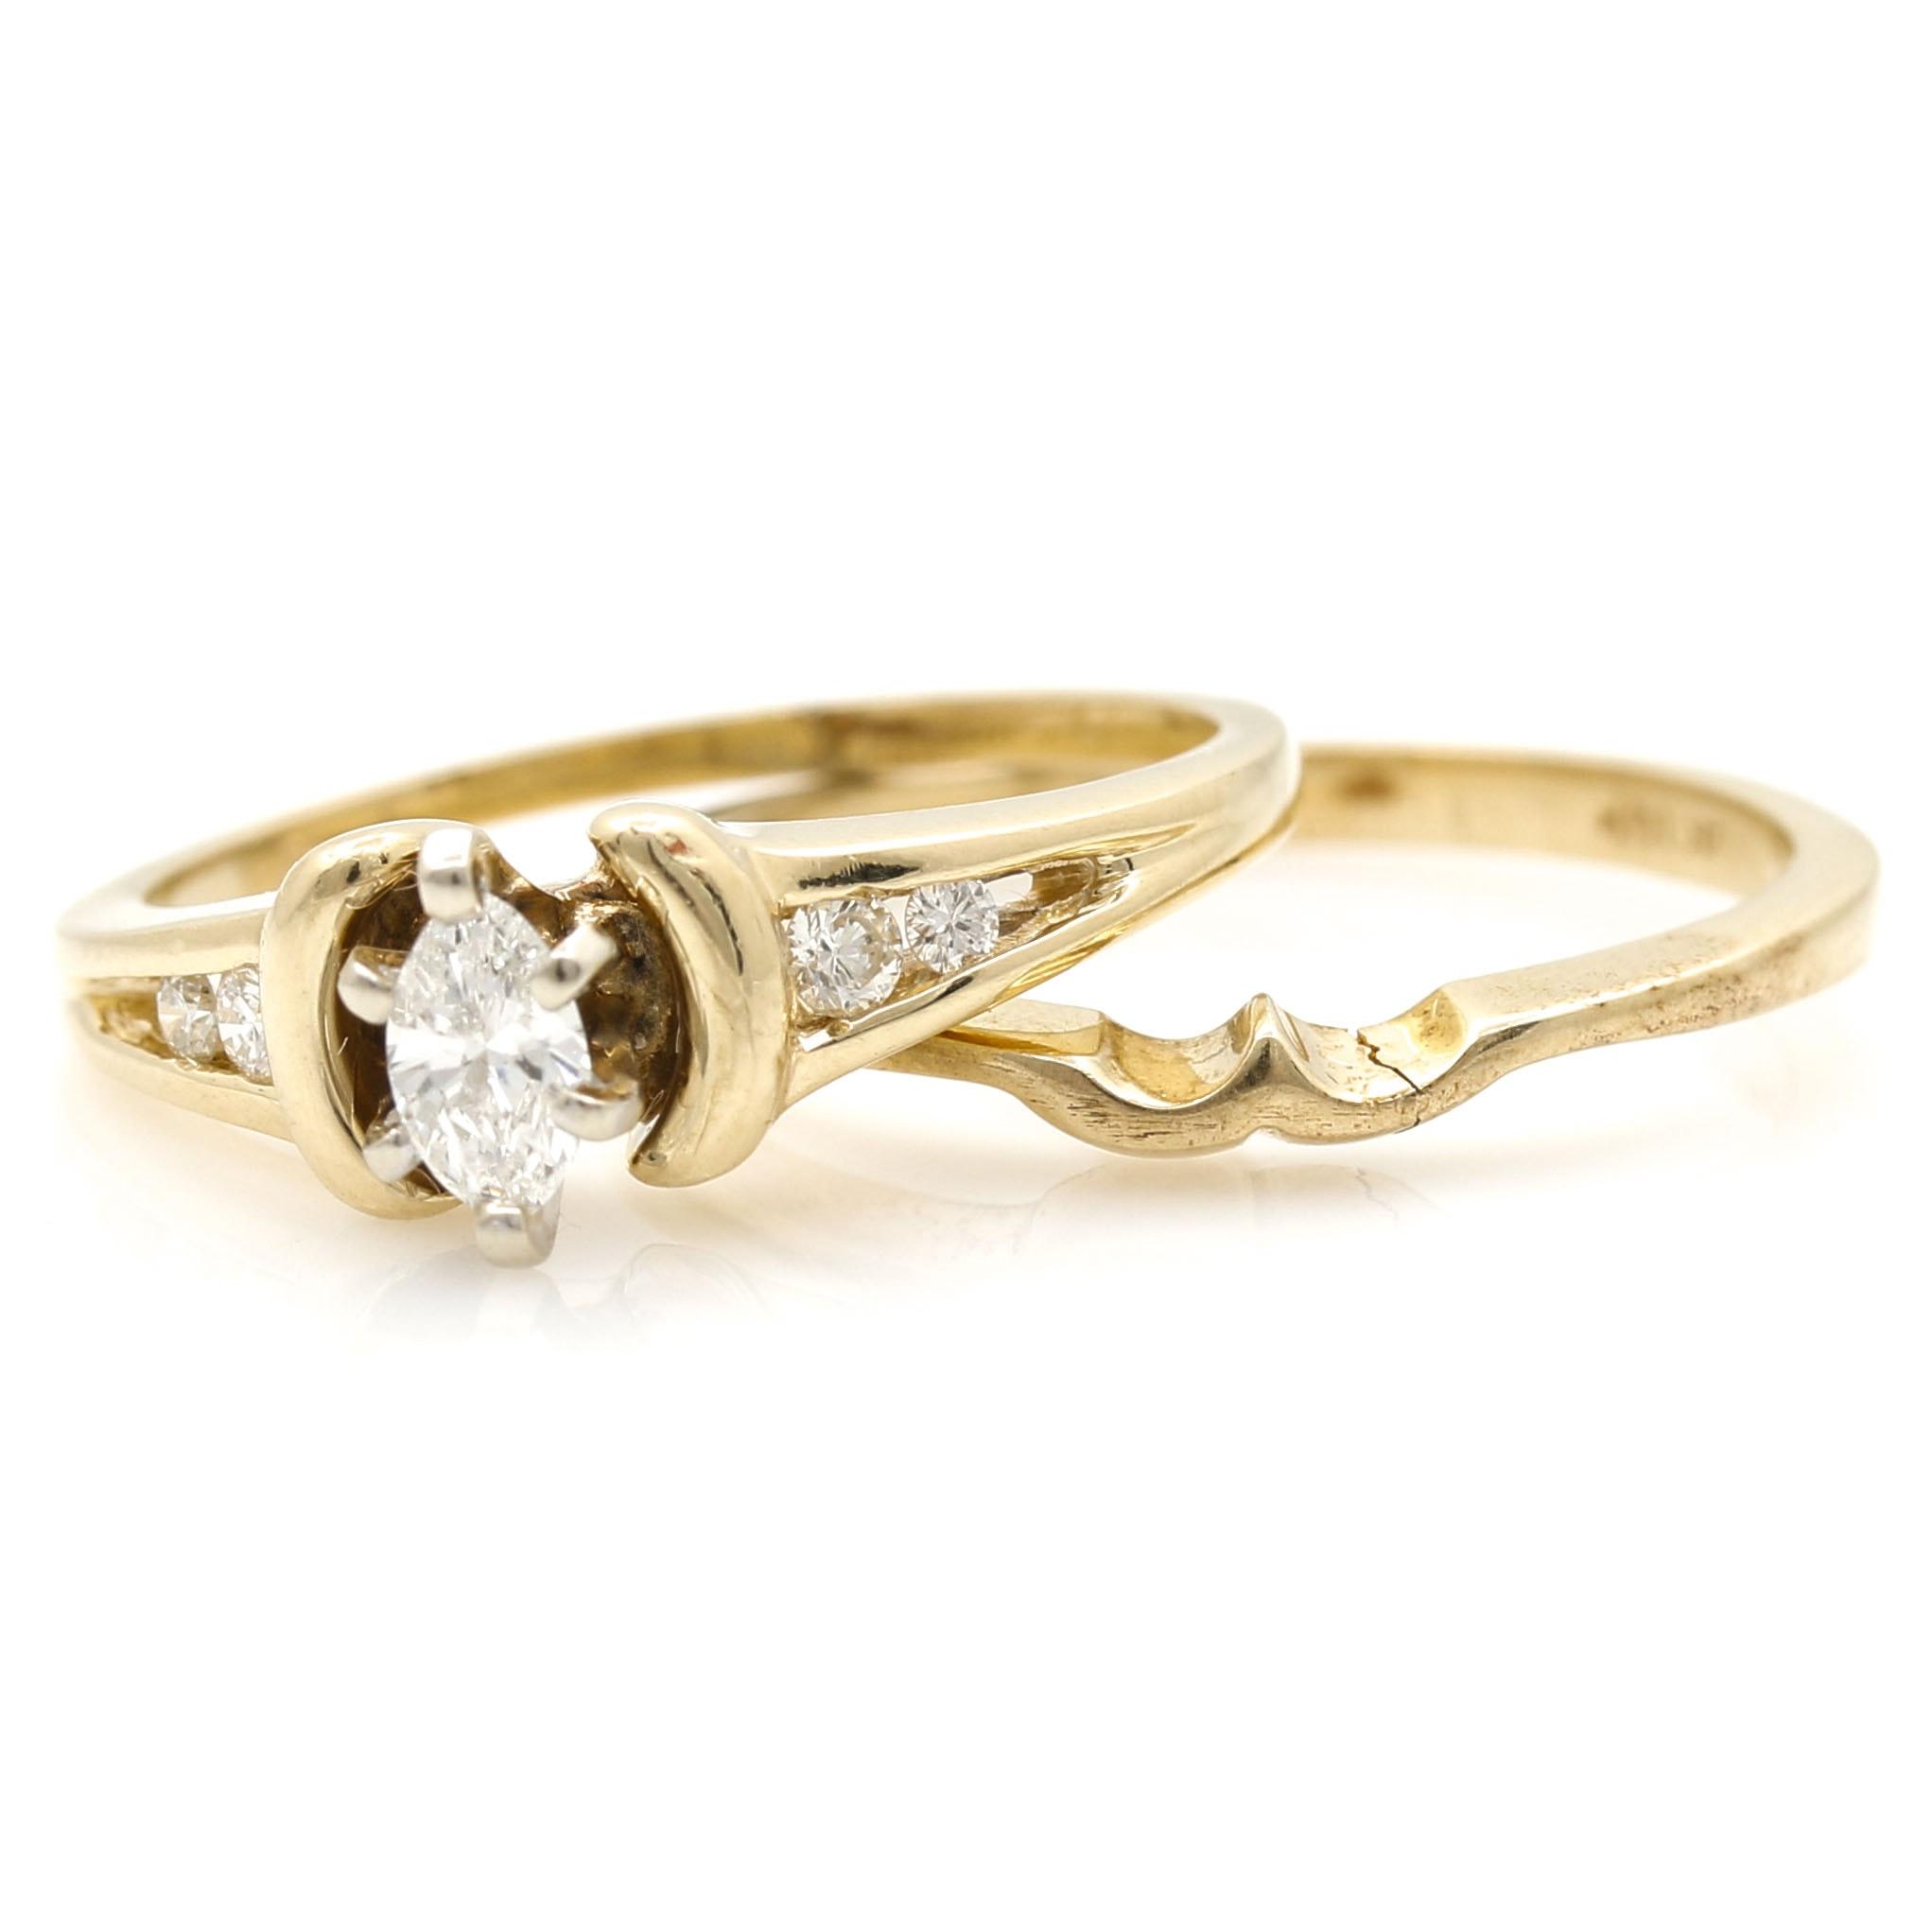 14K Yellow Gold and Diamond Bridal Set